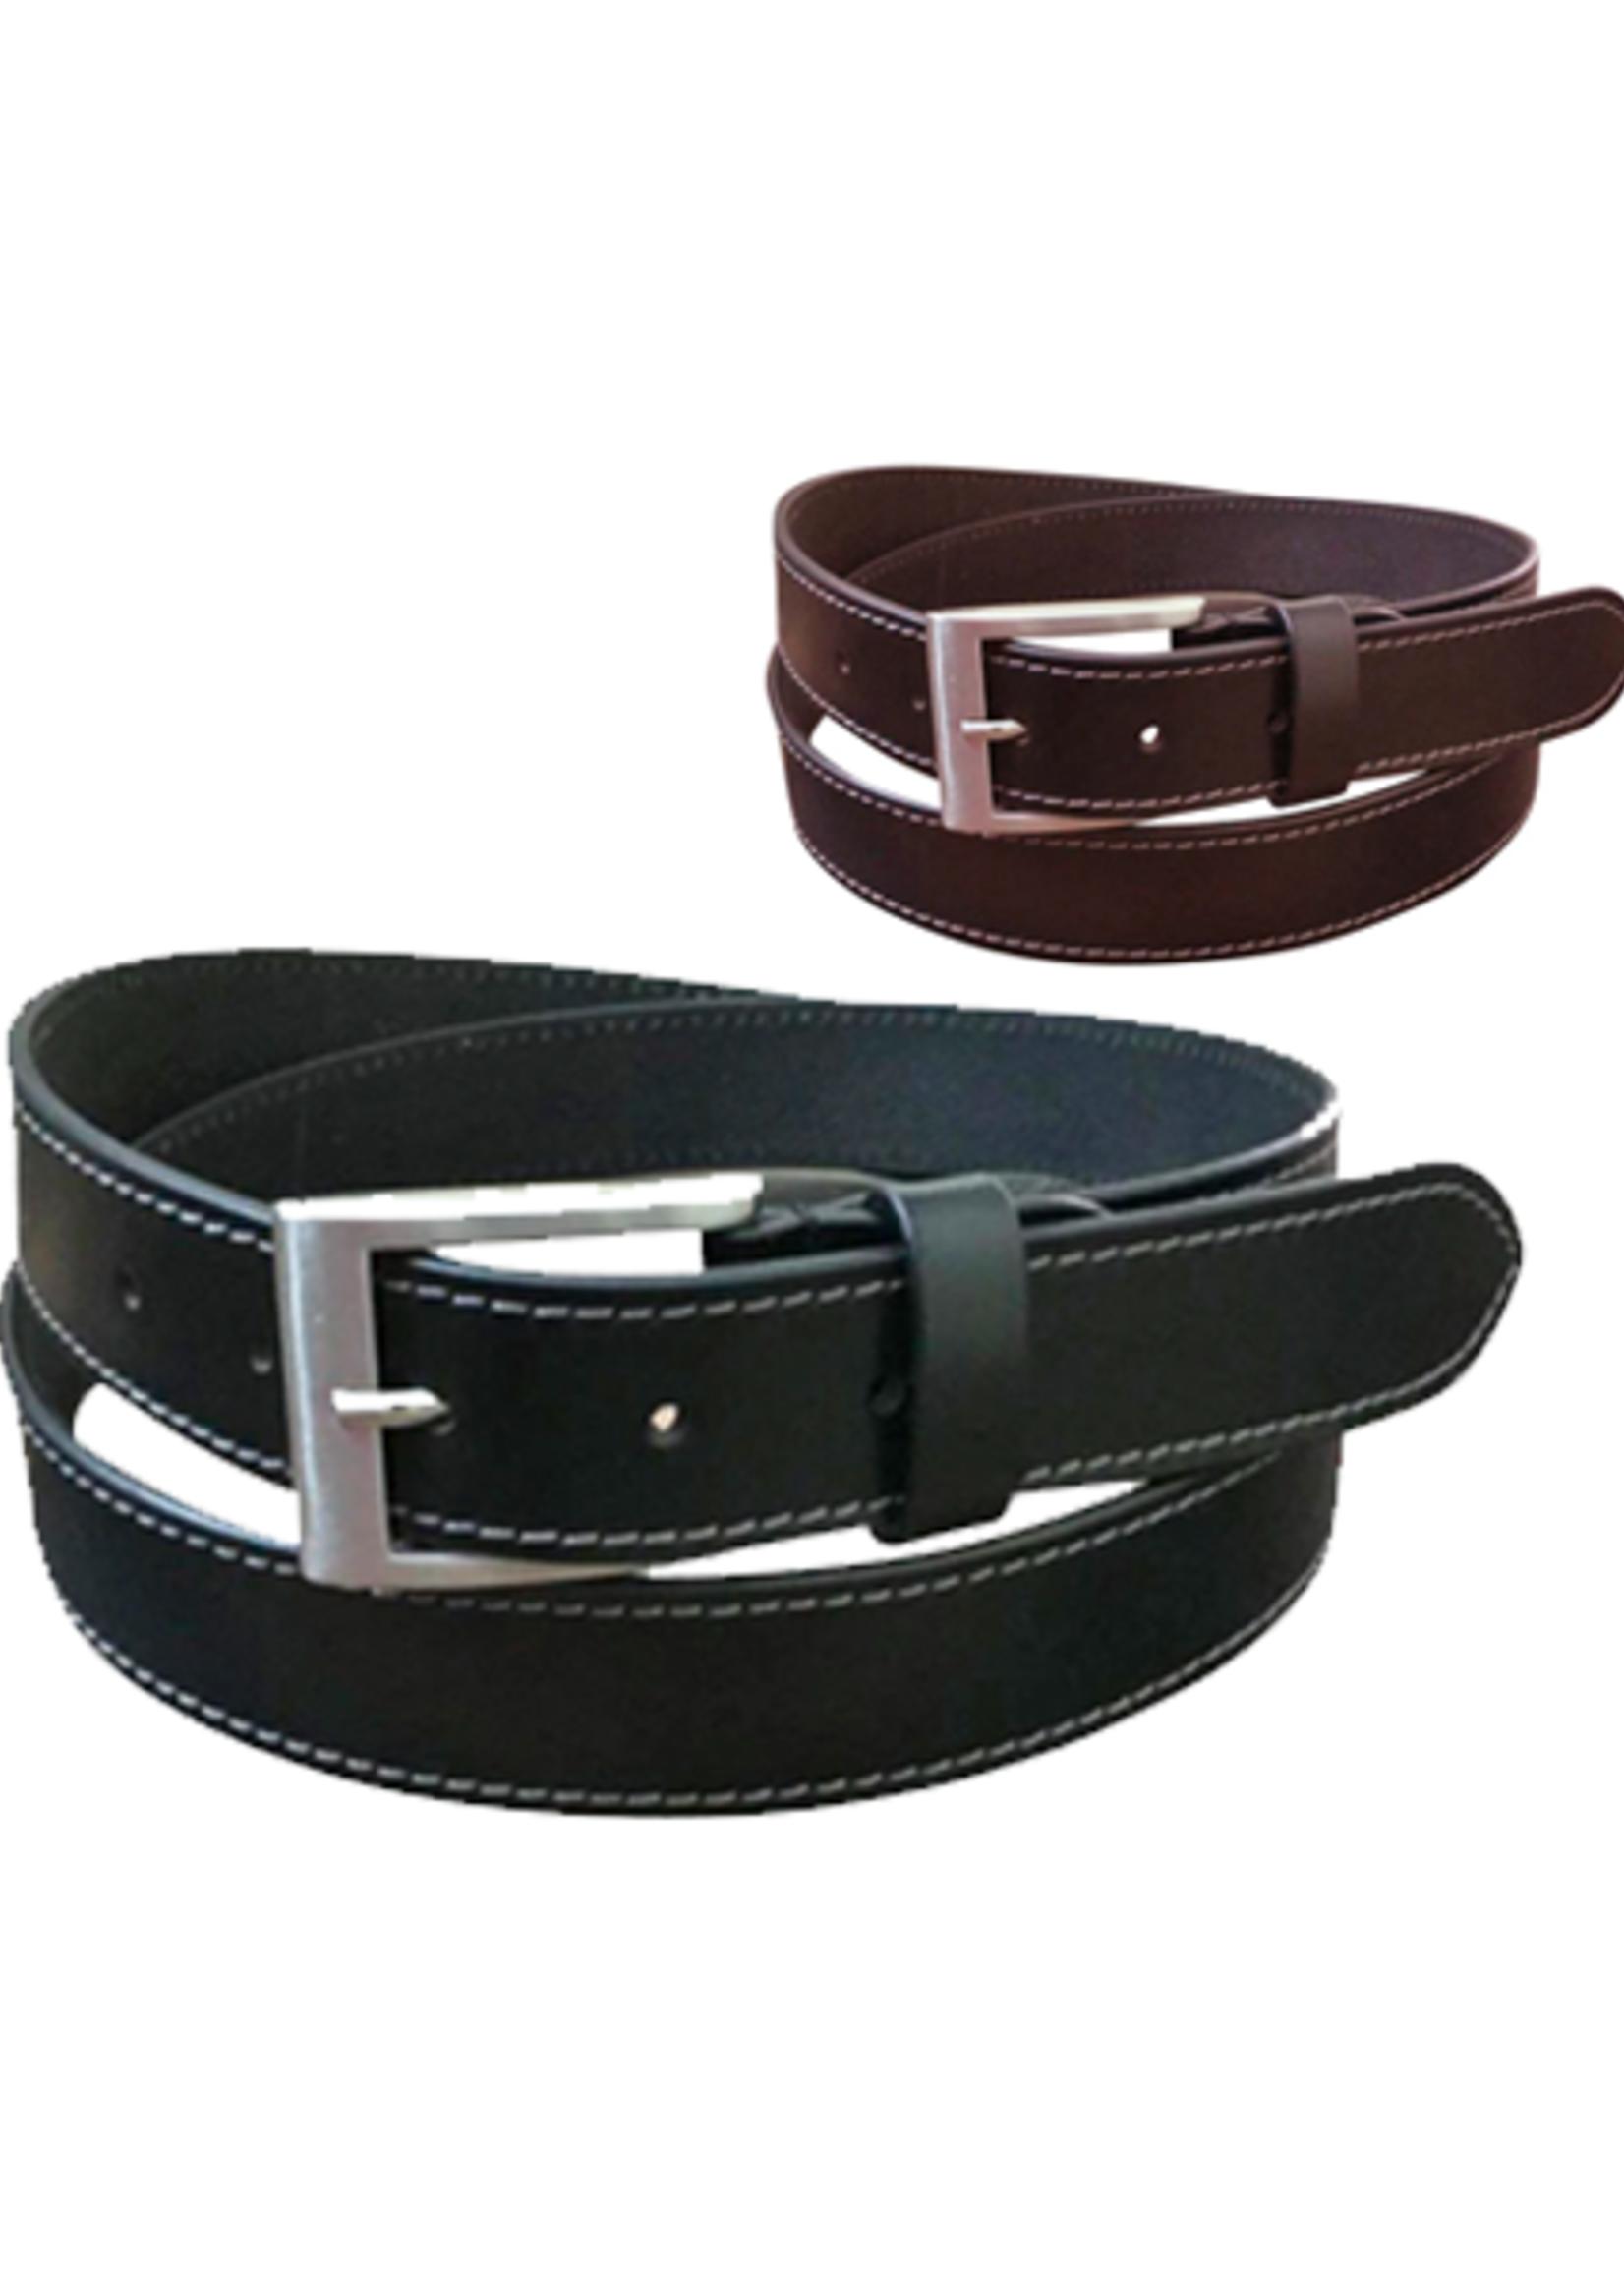 Jacaru Stitched Leather Belt 6014